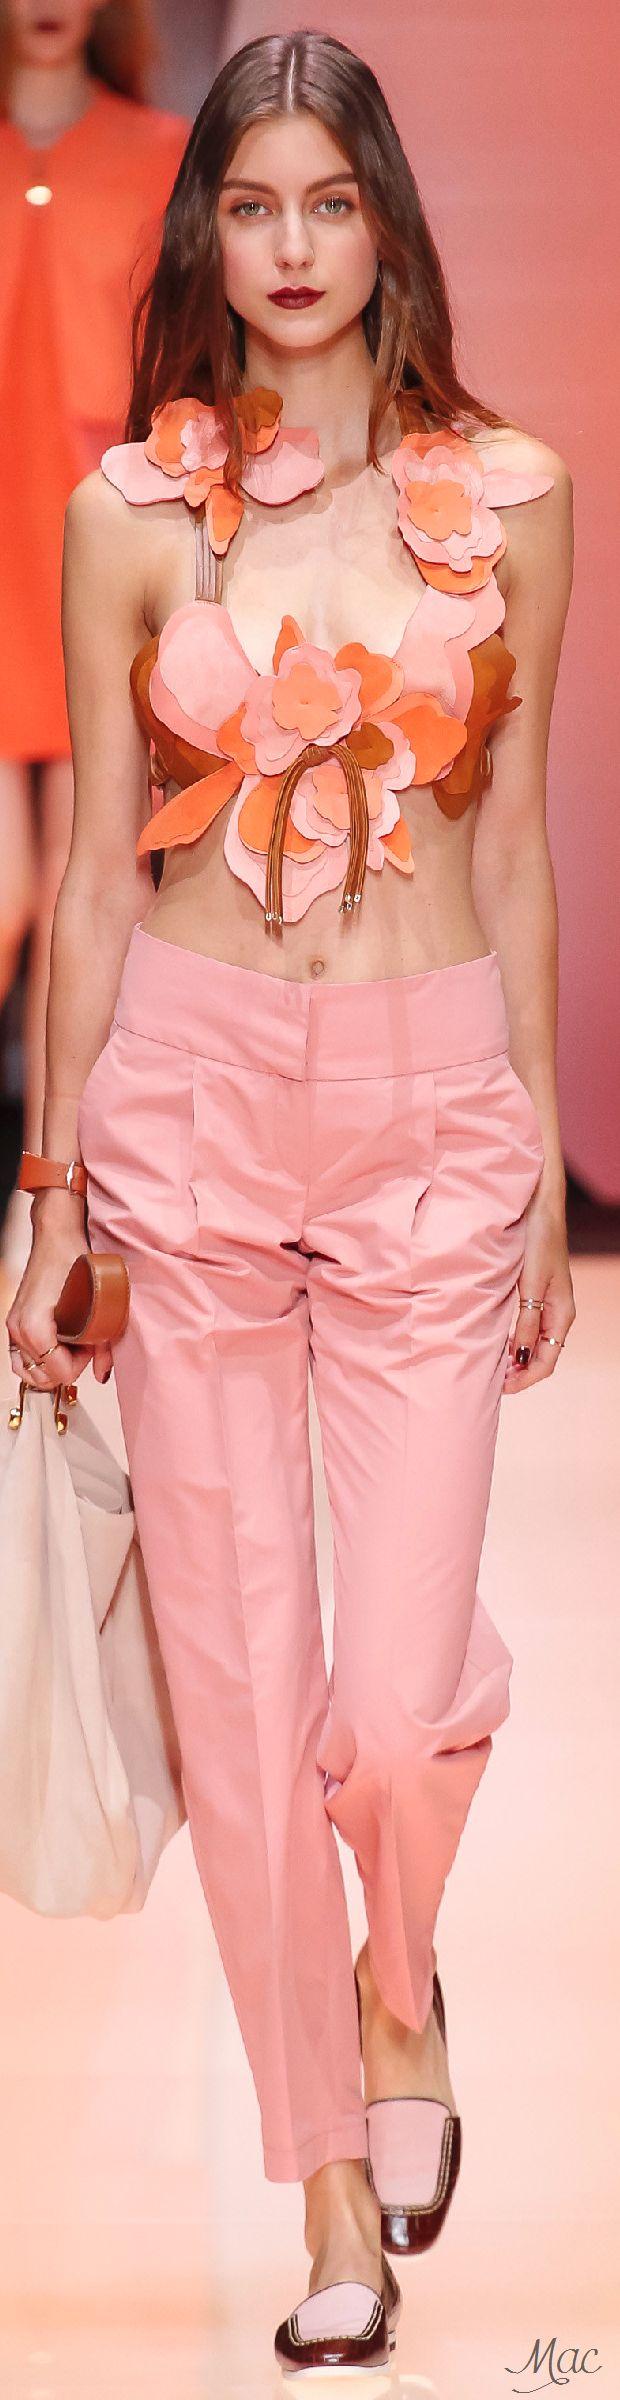 Spring 2016 Ready-to-Wear Emporio Armani women fashion outfit clothing style apparel @roressclothes closet ideas